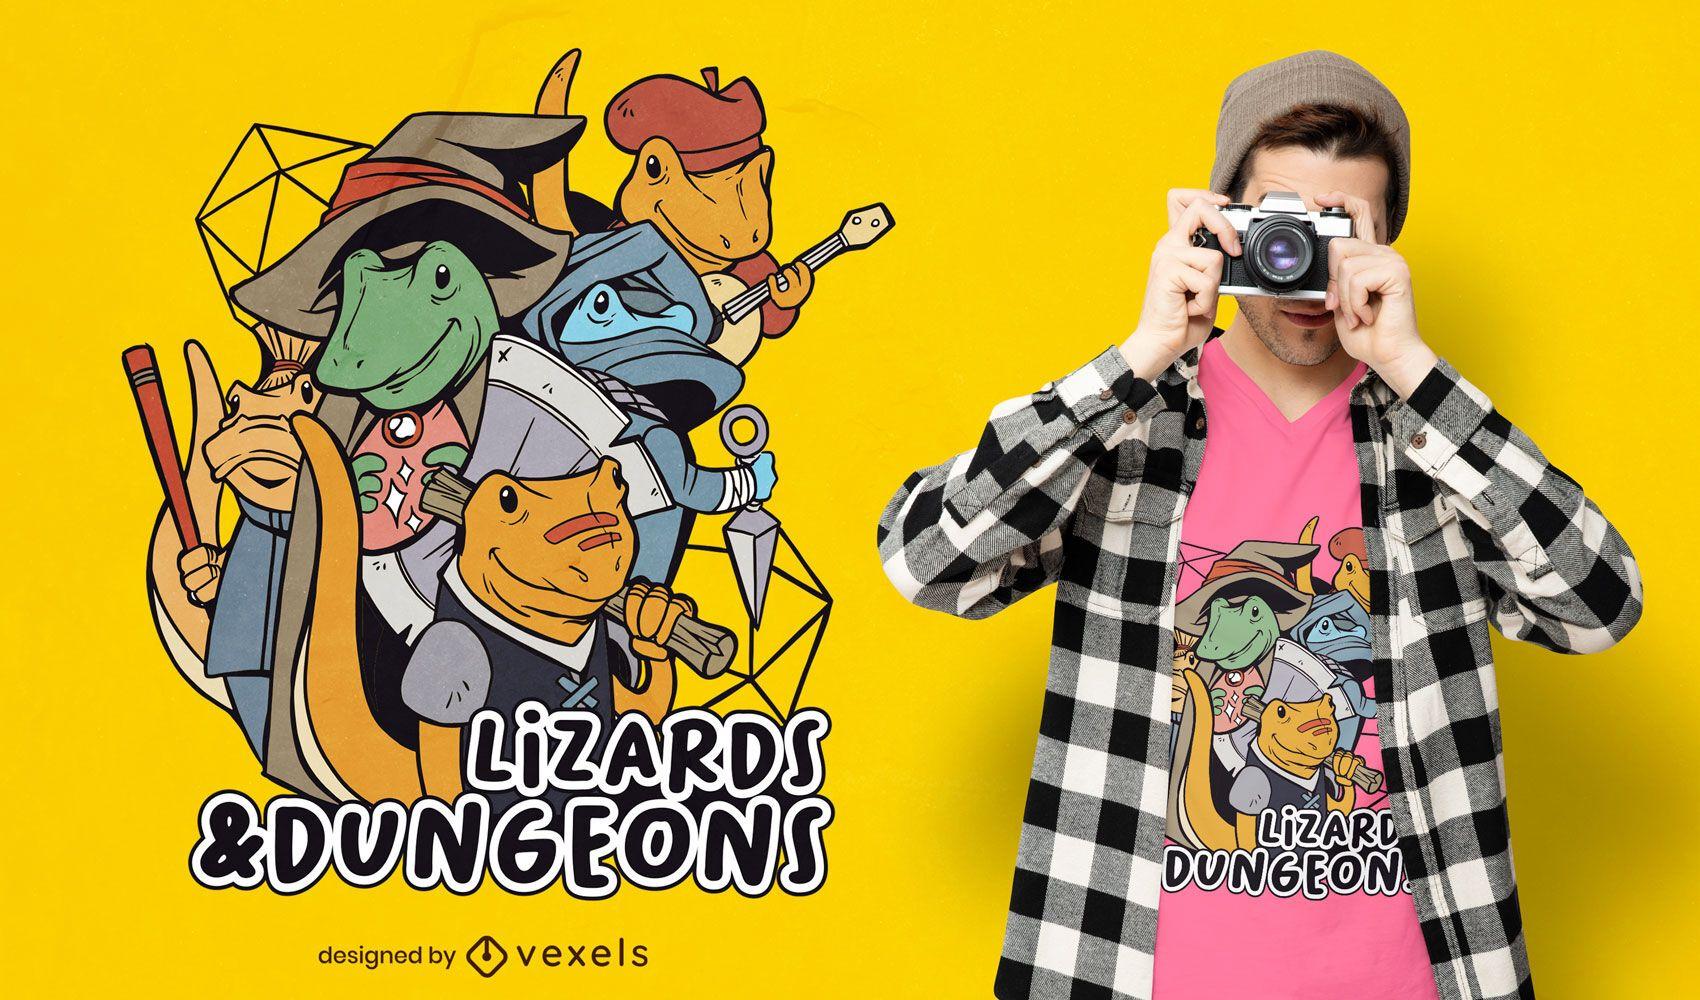 Lizards and dungeons t-shirt design